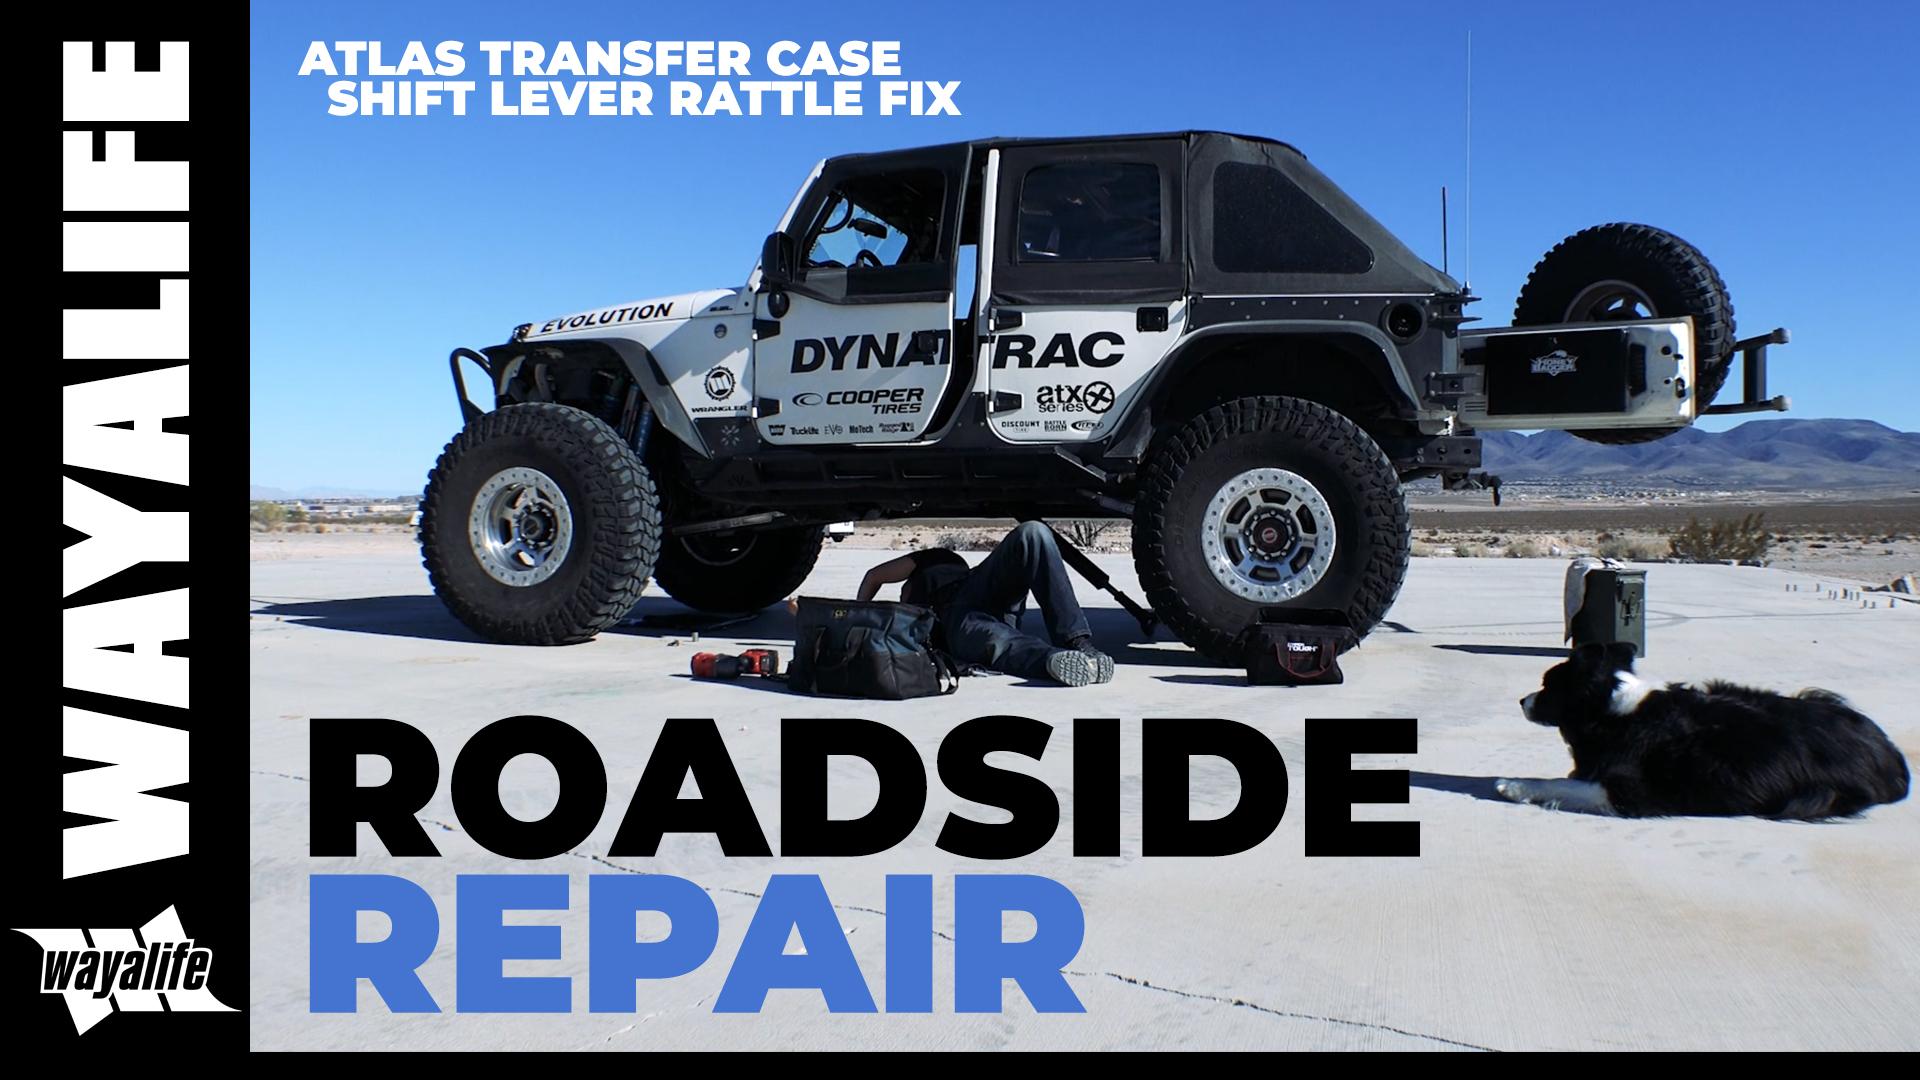 ROADSIDE REPAIR – How to FIX an Atlas Shift Lever Rattle